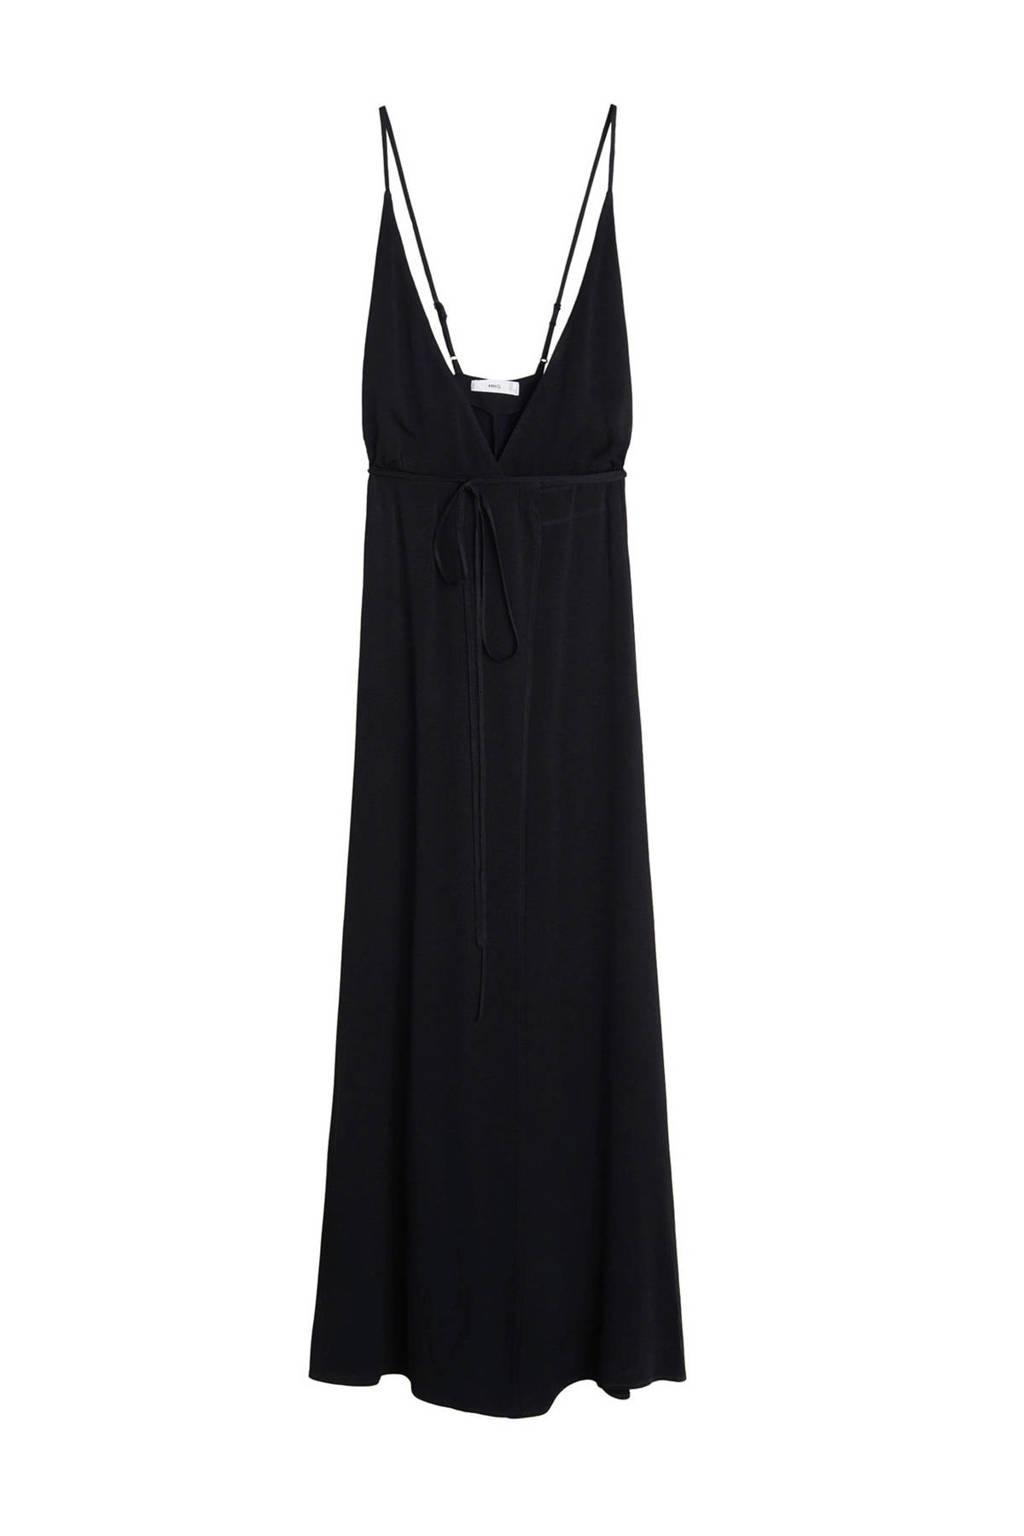 Mango jersey jurk met ceintuur zwart, Zwart